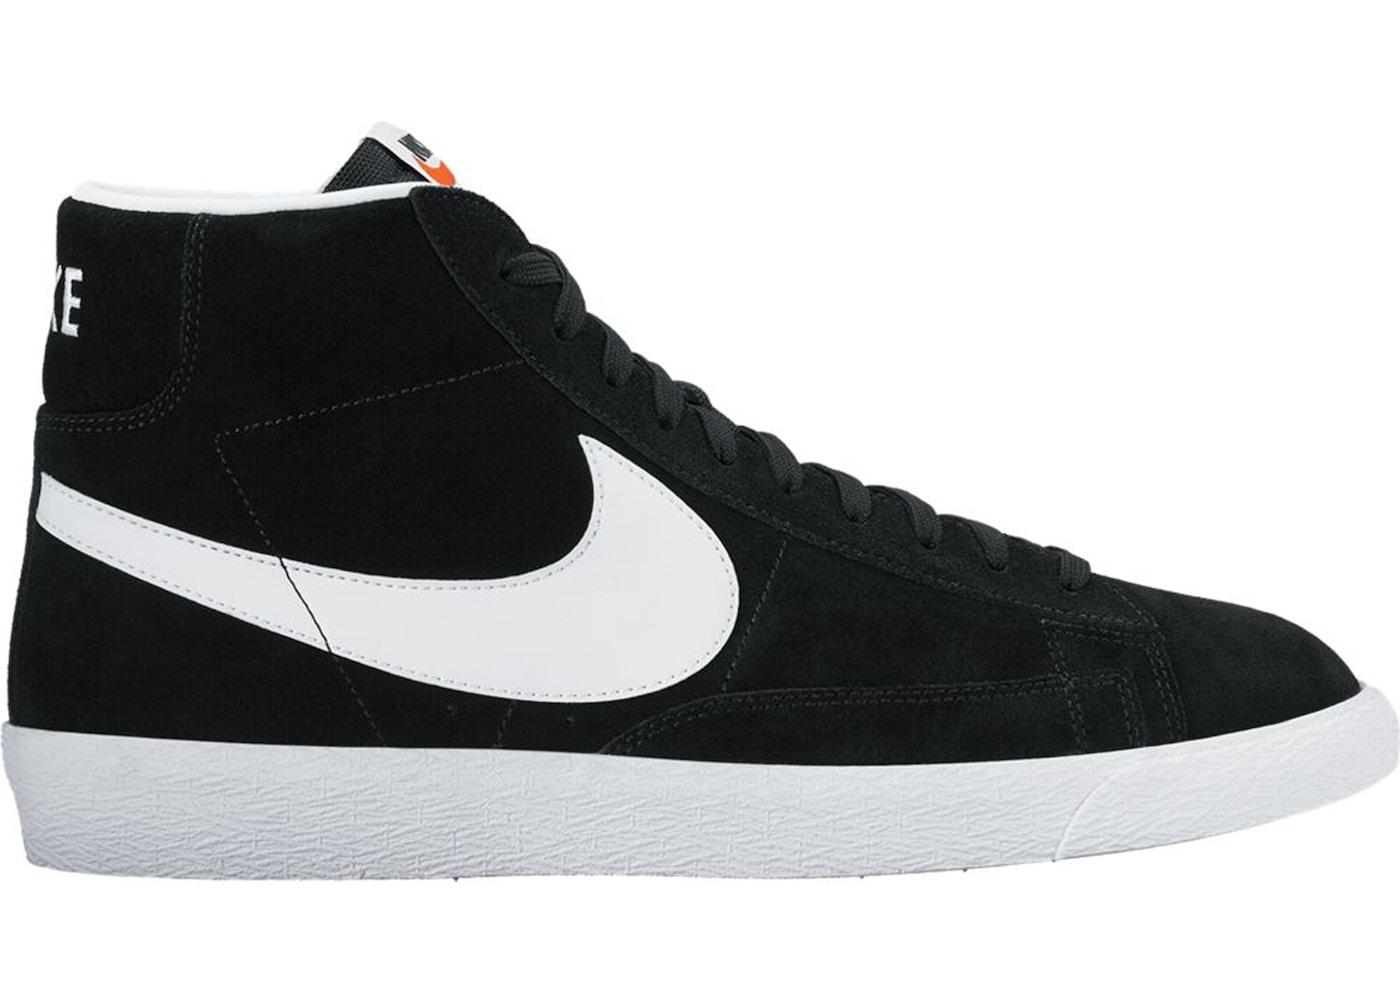 Nike Blazer Mid Premium Black White Gum